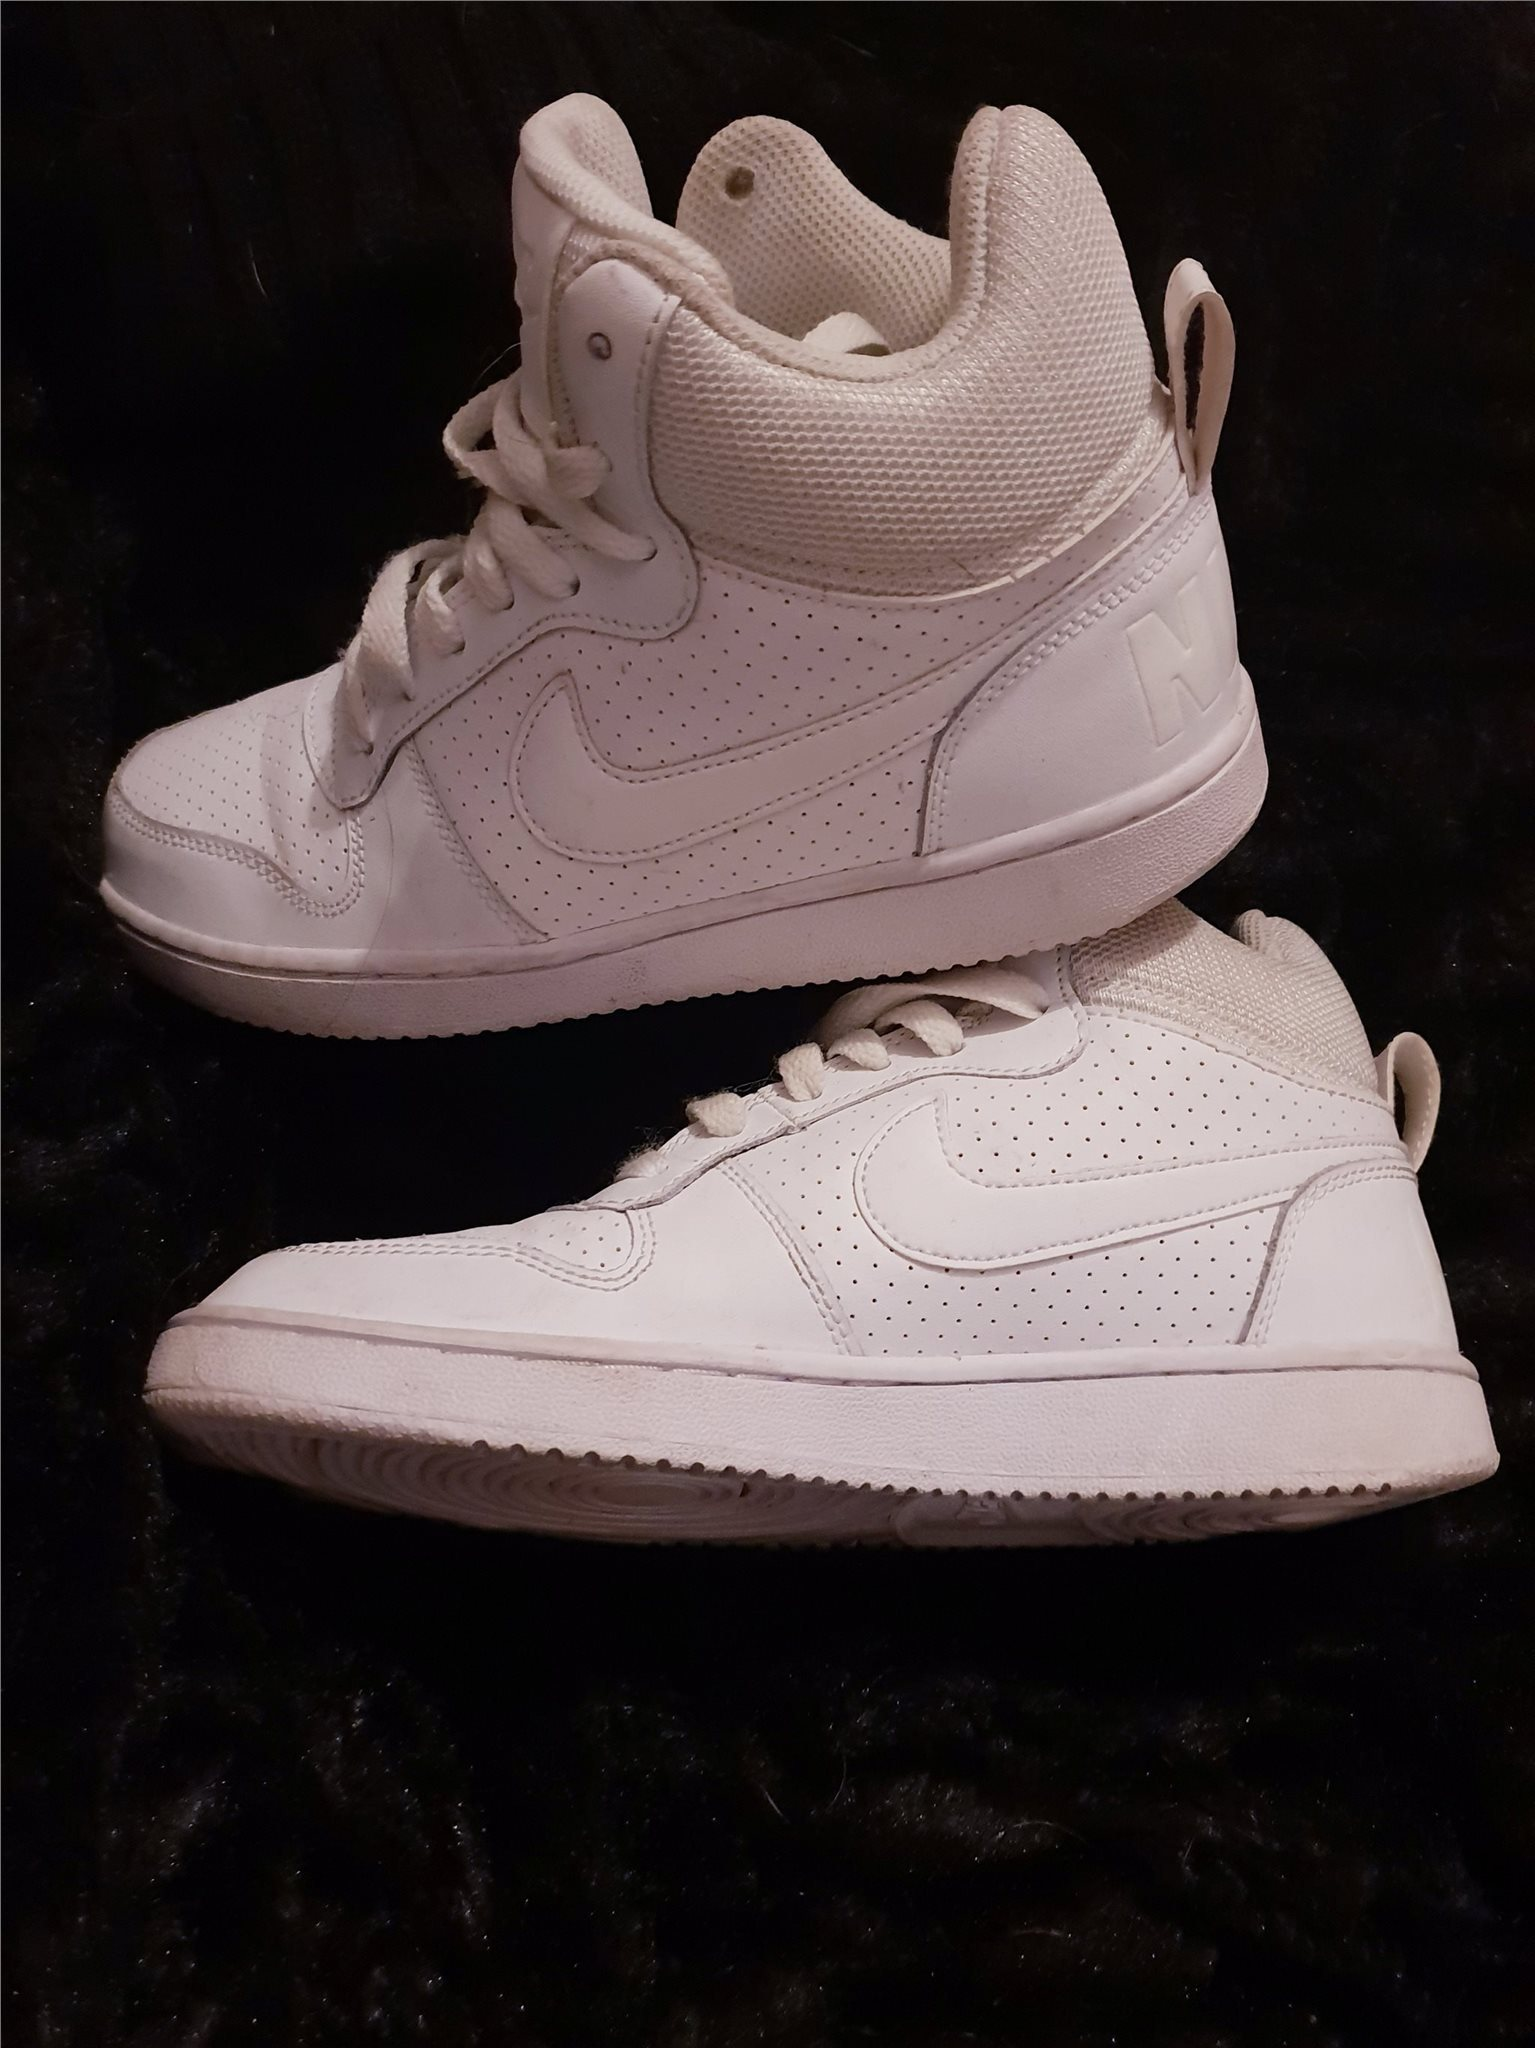 innovative design 5e56c 007ac Nike air SNEAKERS 37 37,5 ENBART PROVADE vita skor